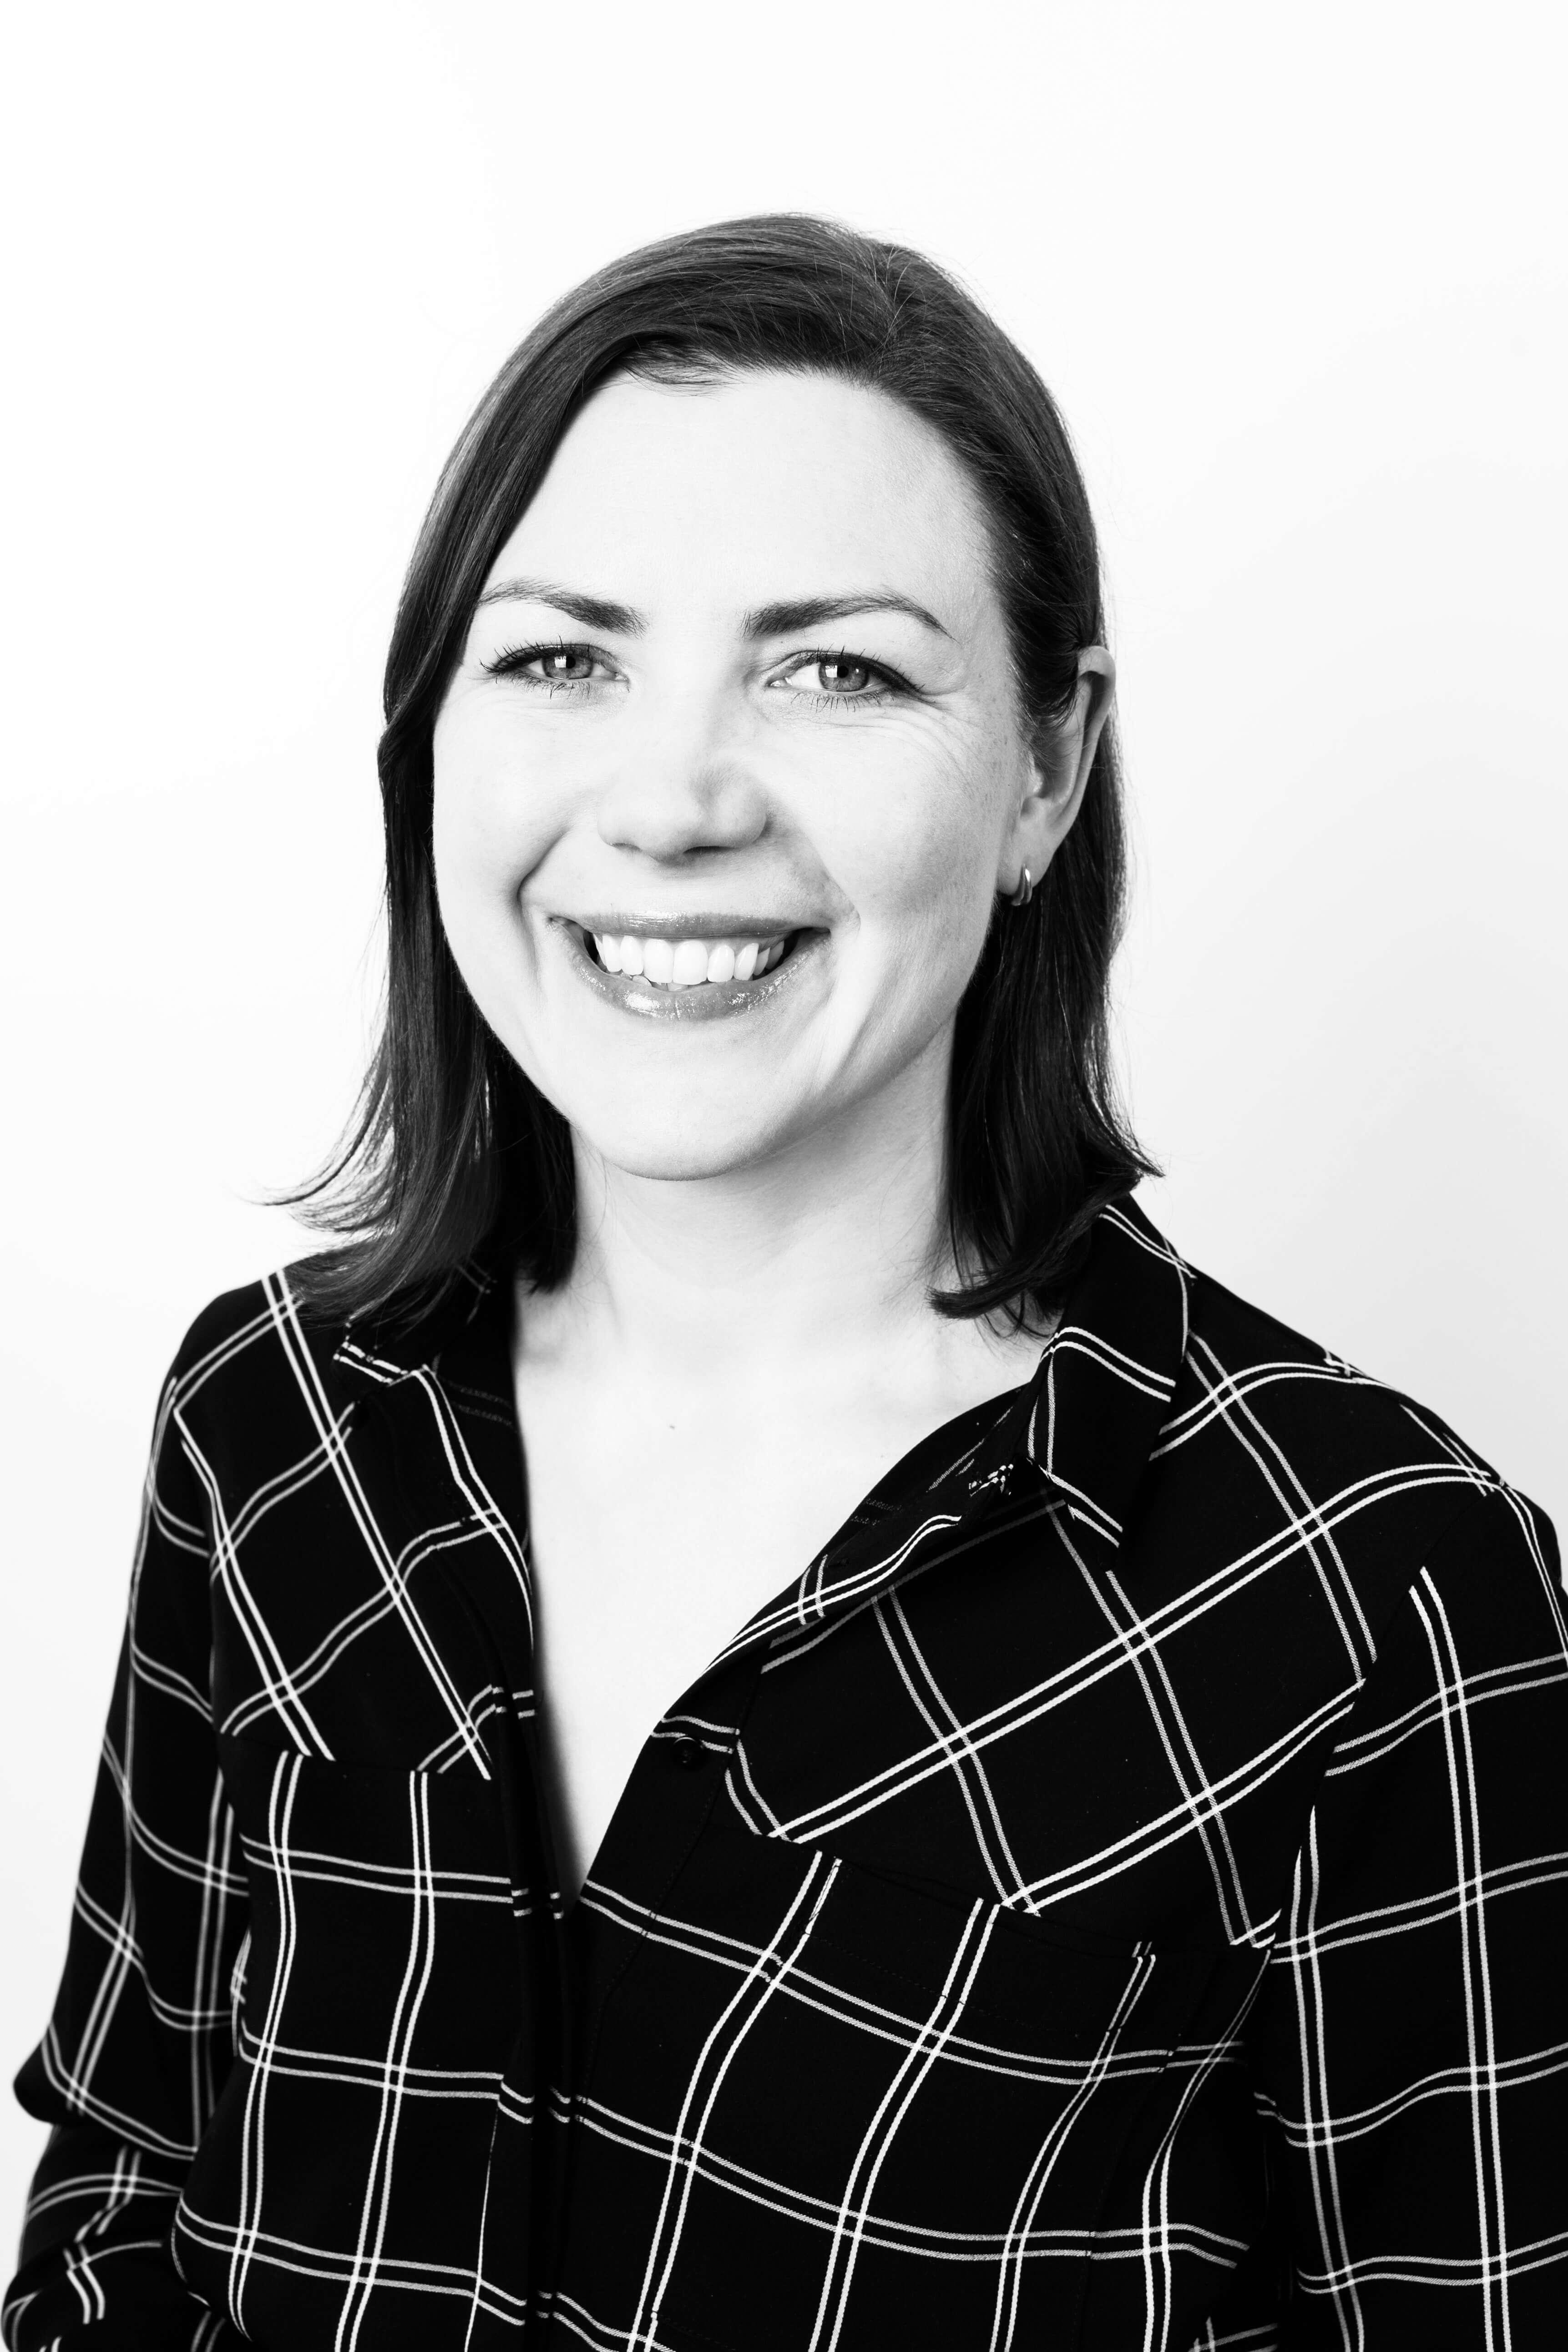 Nicola Kane